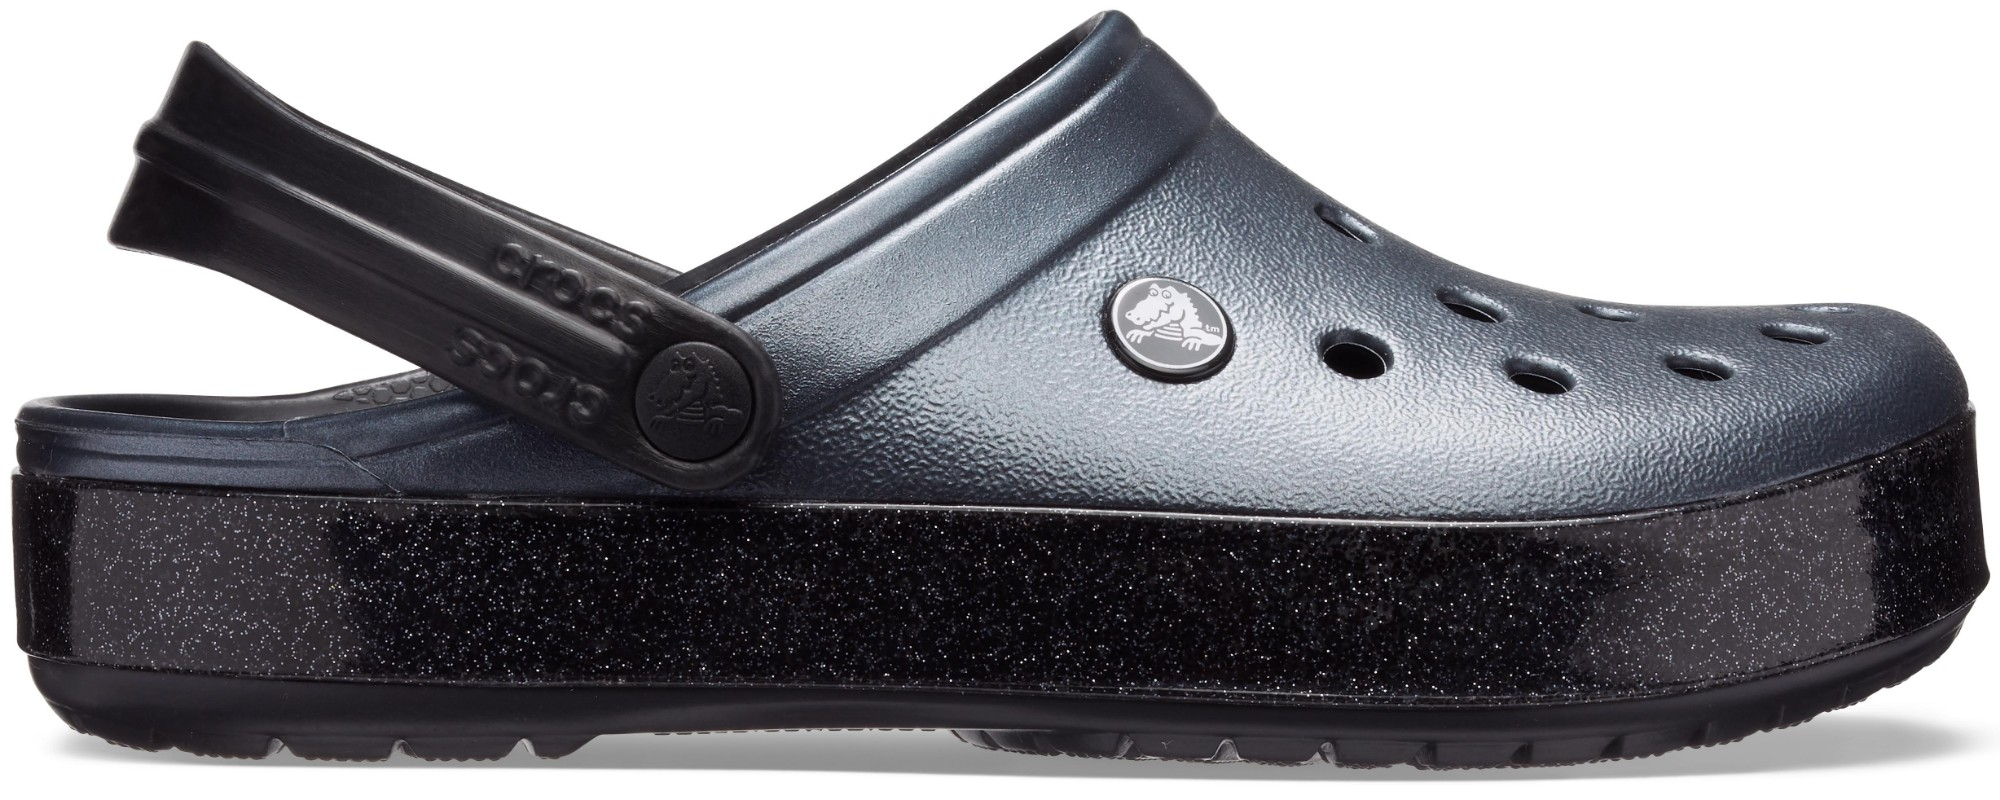 Crocs™ Crocband Printed Clog Metallic Black 38,5